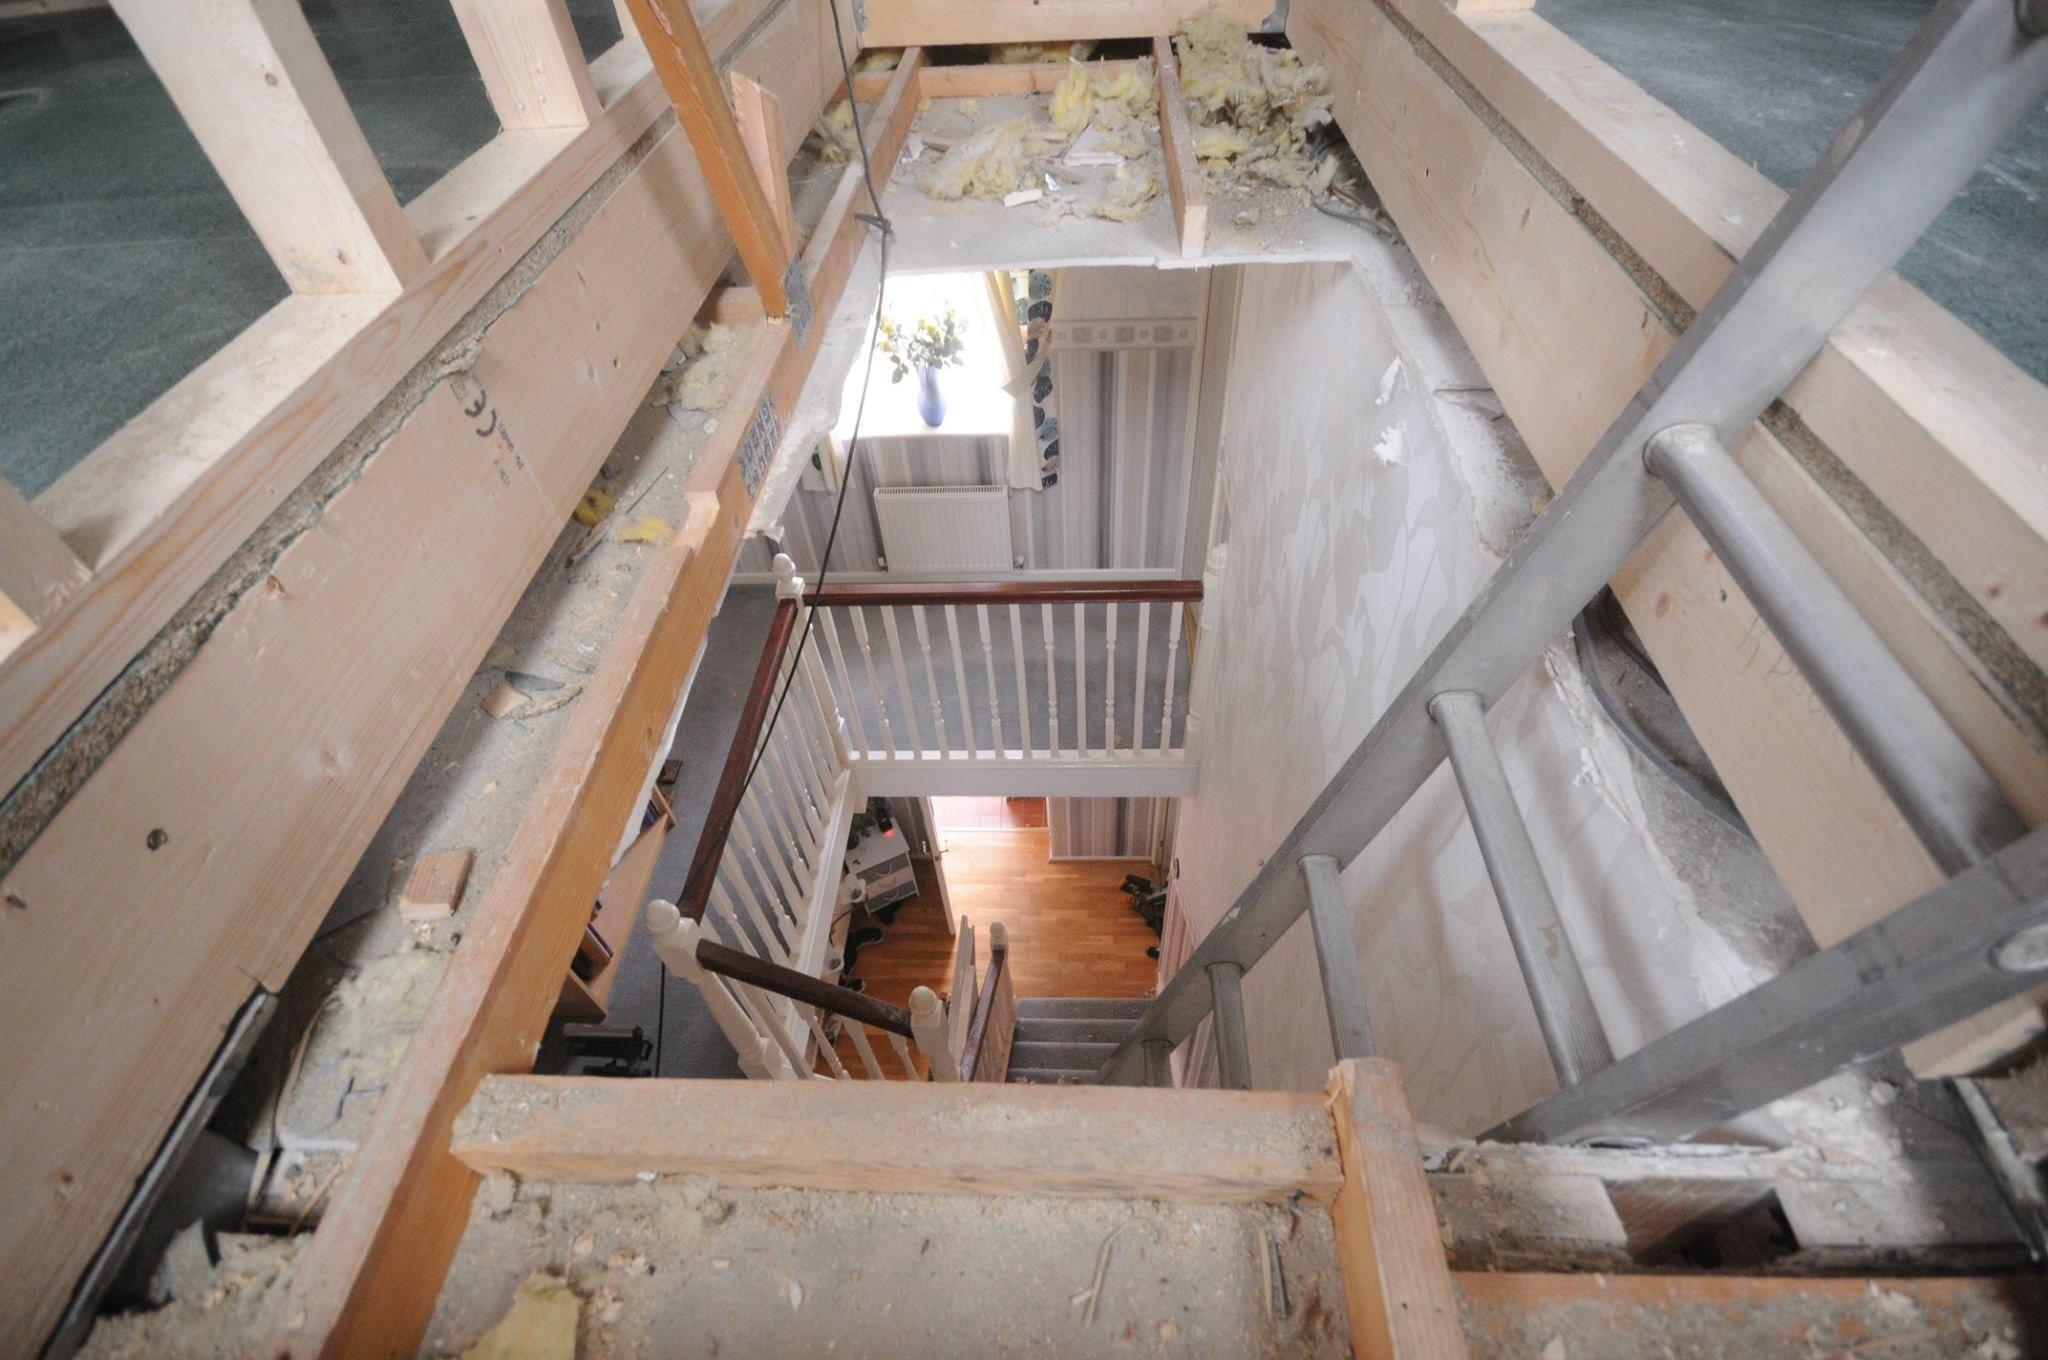 Https Www Facebook Com 667335659960224 Photos A 1769048586455587 1801768966516882 Type 3 Theater Loft Conversion Loft Stairs